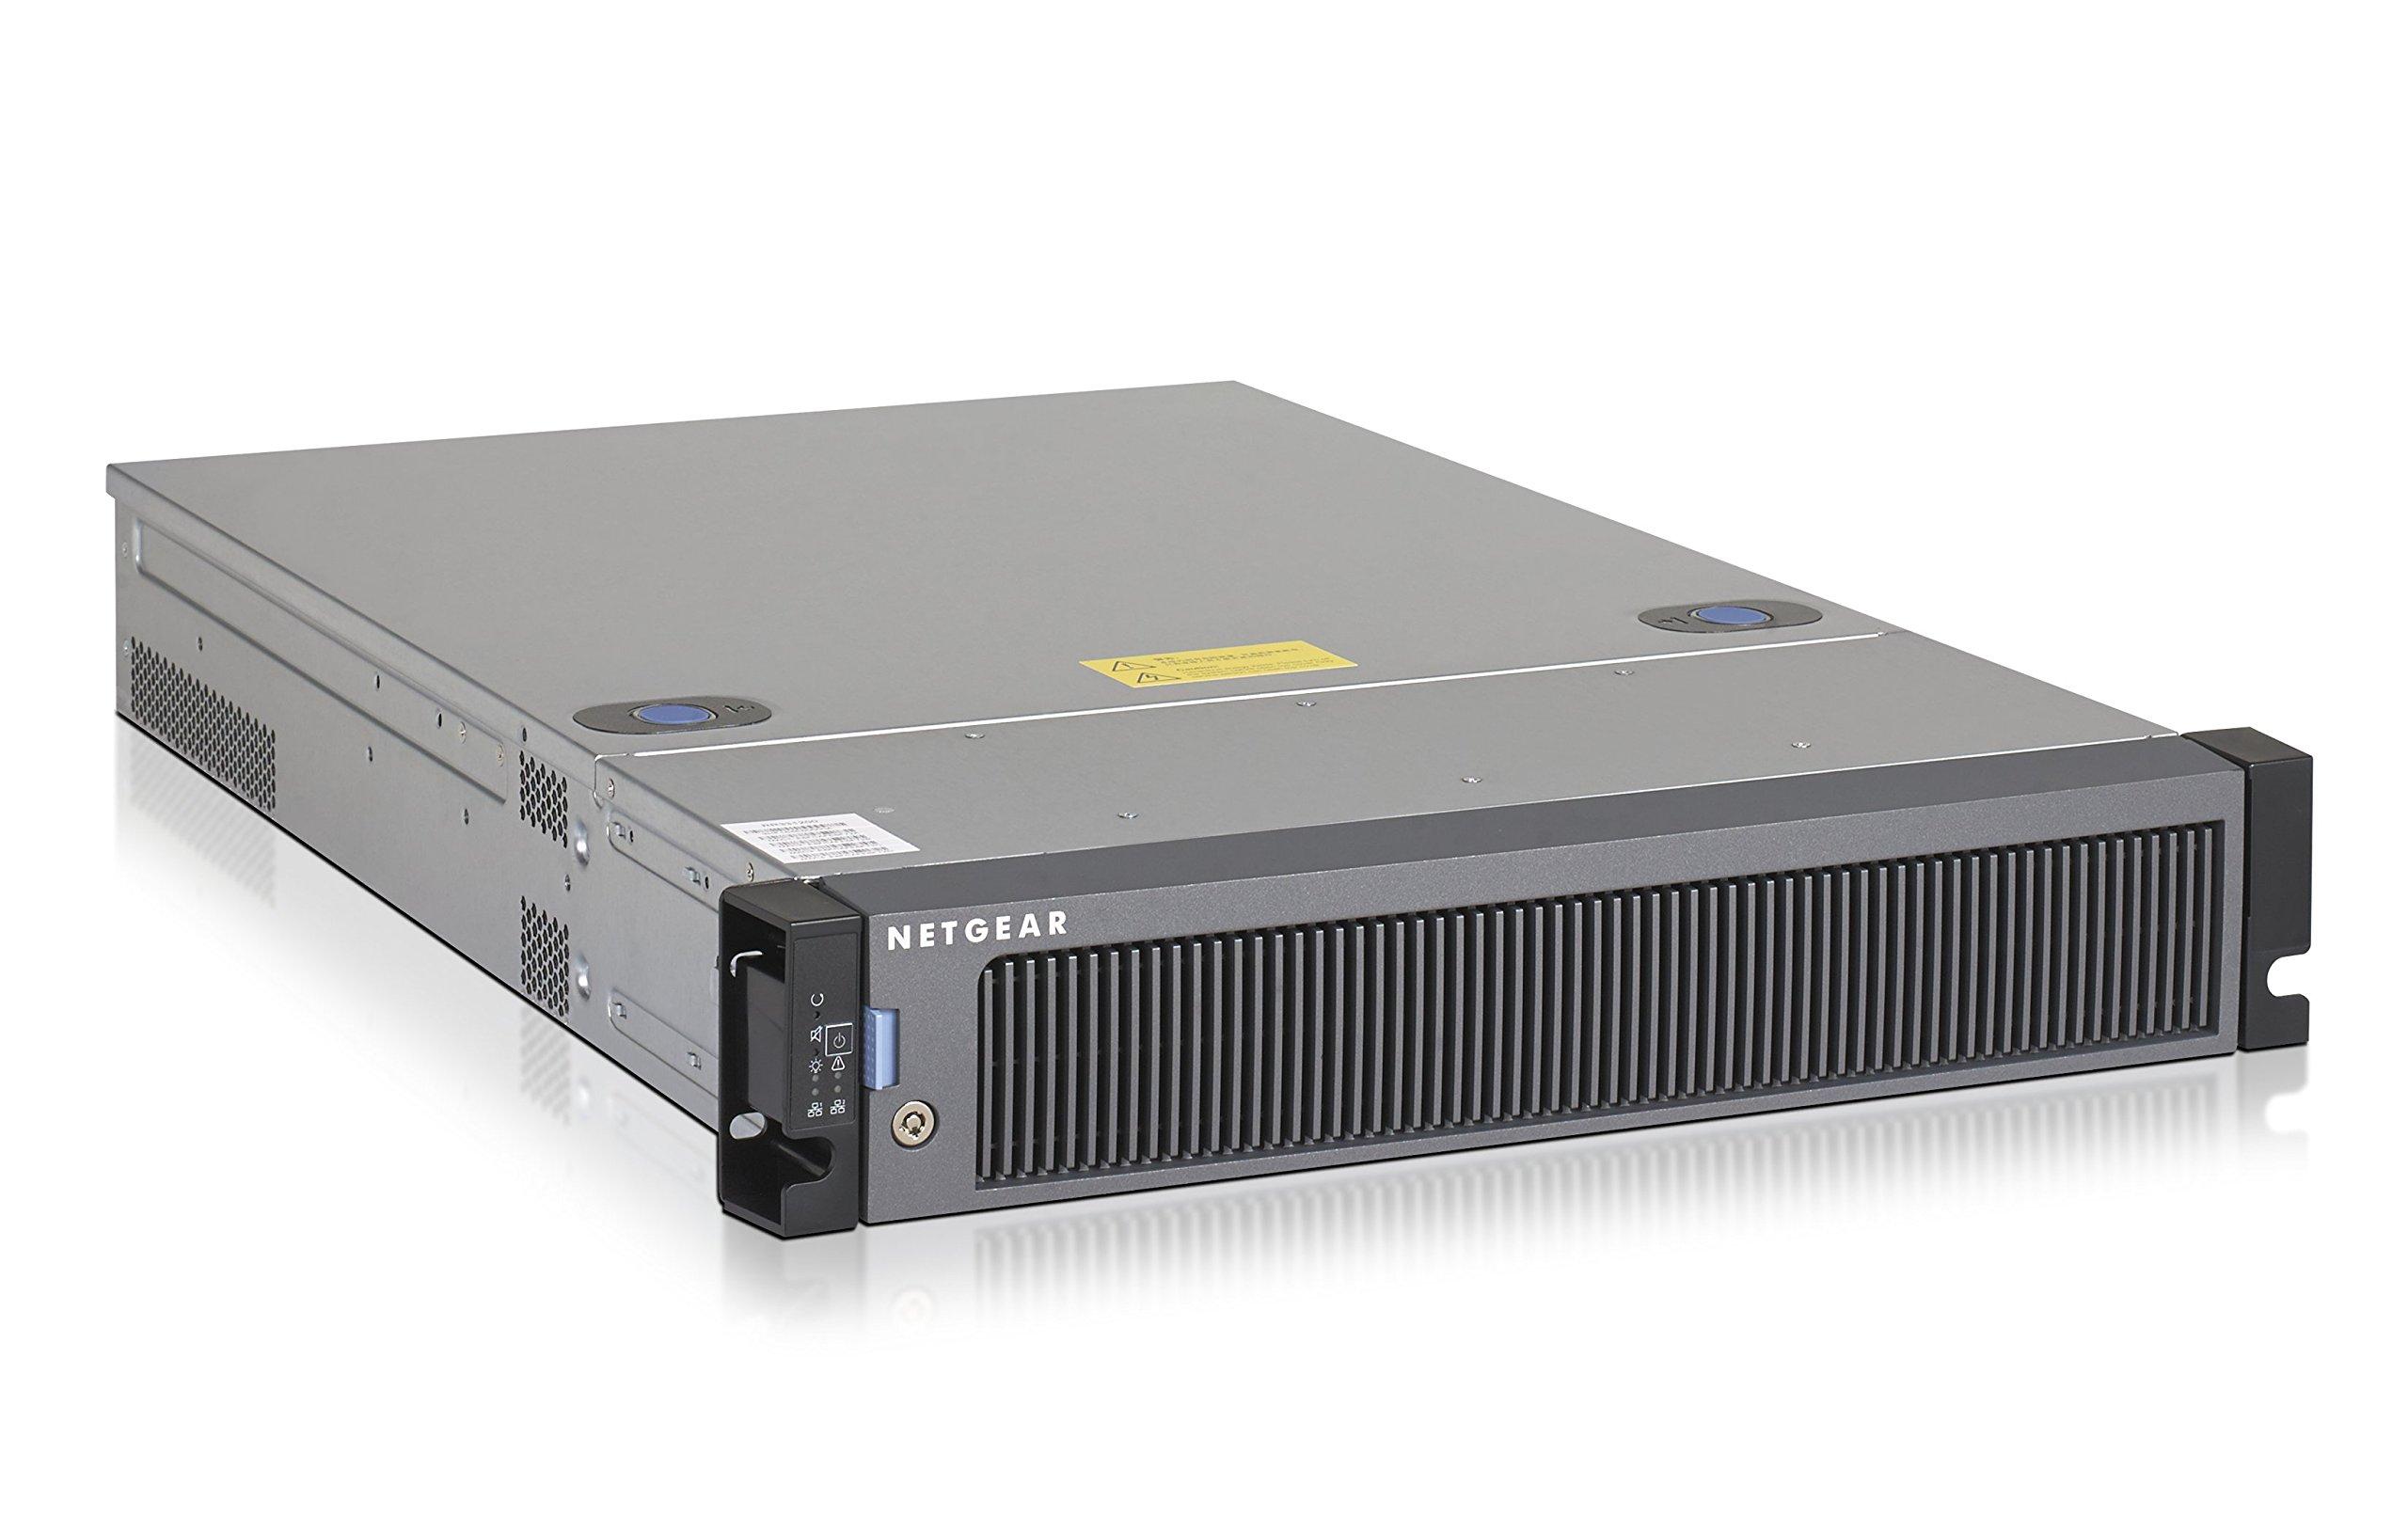 NETGEAR ReadyNAS 4312X Network Attached Storage 2X 10Gbase-T 2U Rackmount 12 Bay 12 x 3TB Enterprise HDD (RR4312X3-10000S)